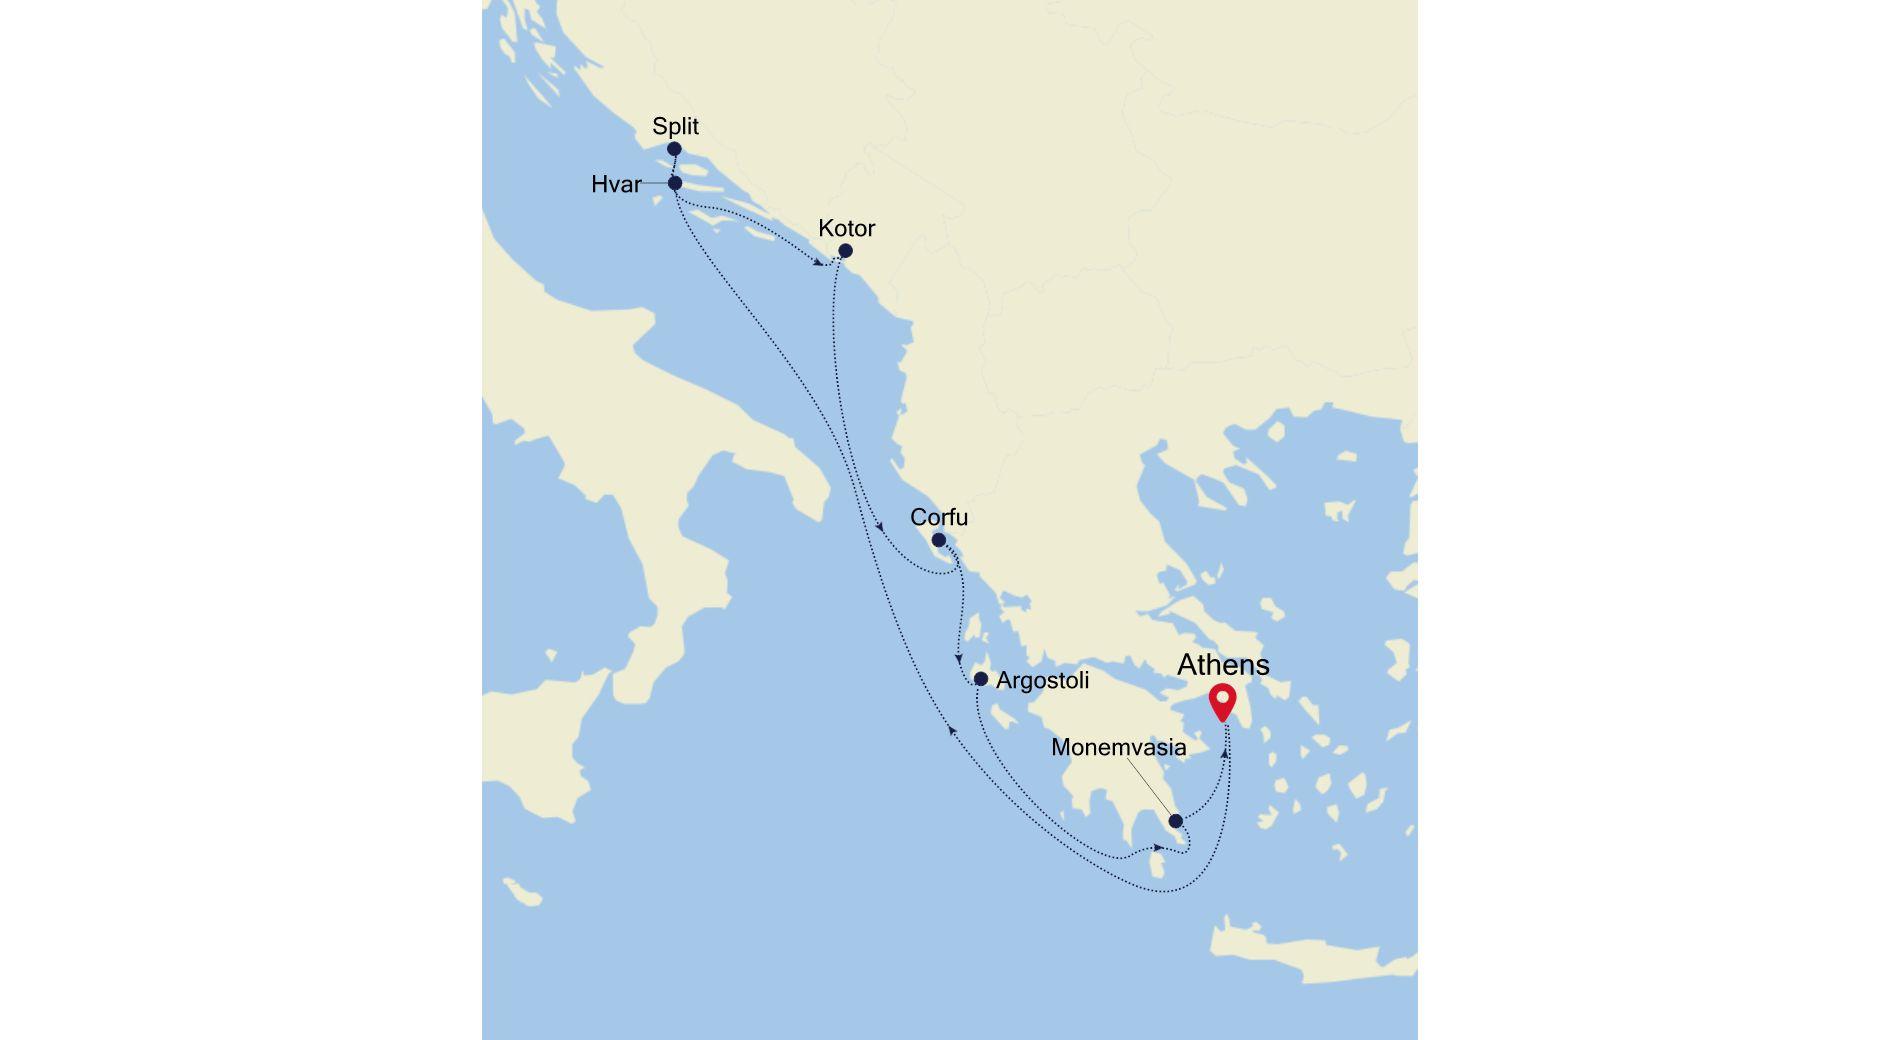 SS200514009 - Venice nach Piraeus